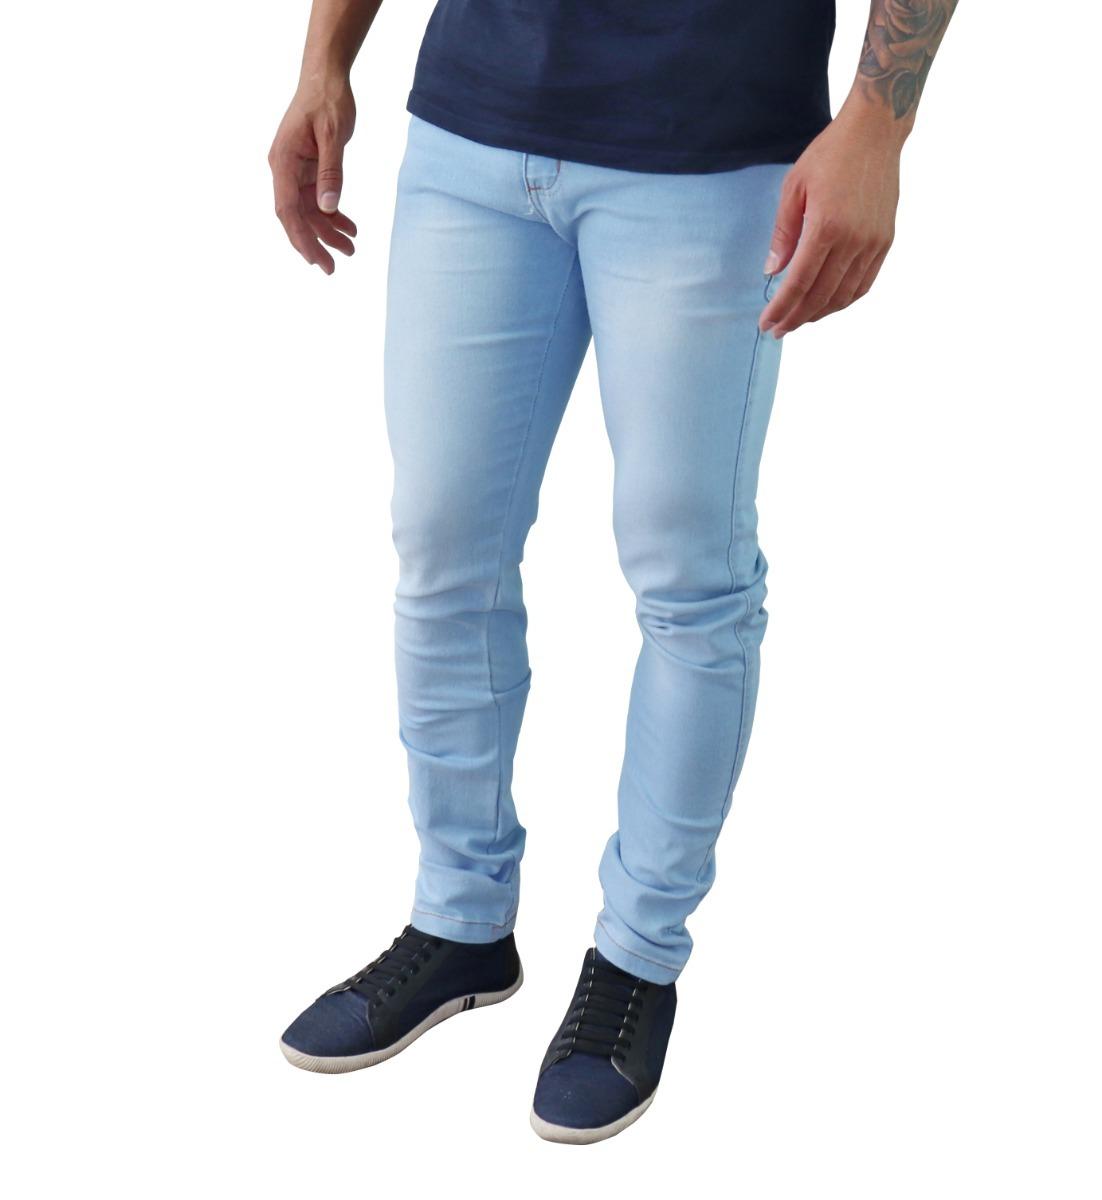 852e974bf Kit Com 3 Calça Jeans Sarja Masculina Skinny Slim Com Lycra - R$ 118 ...